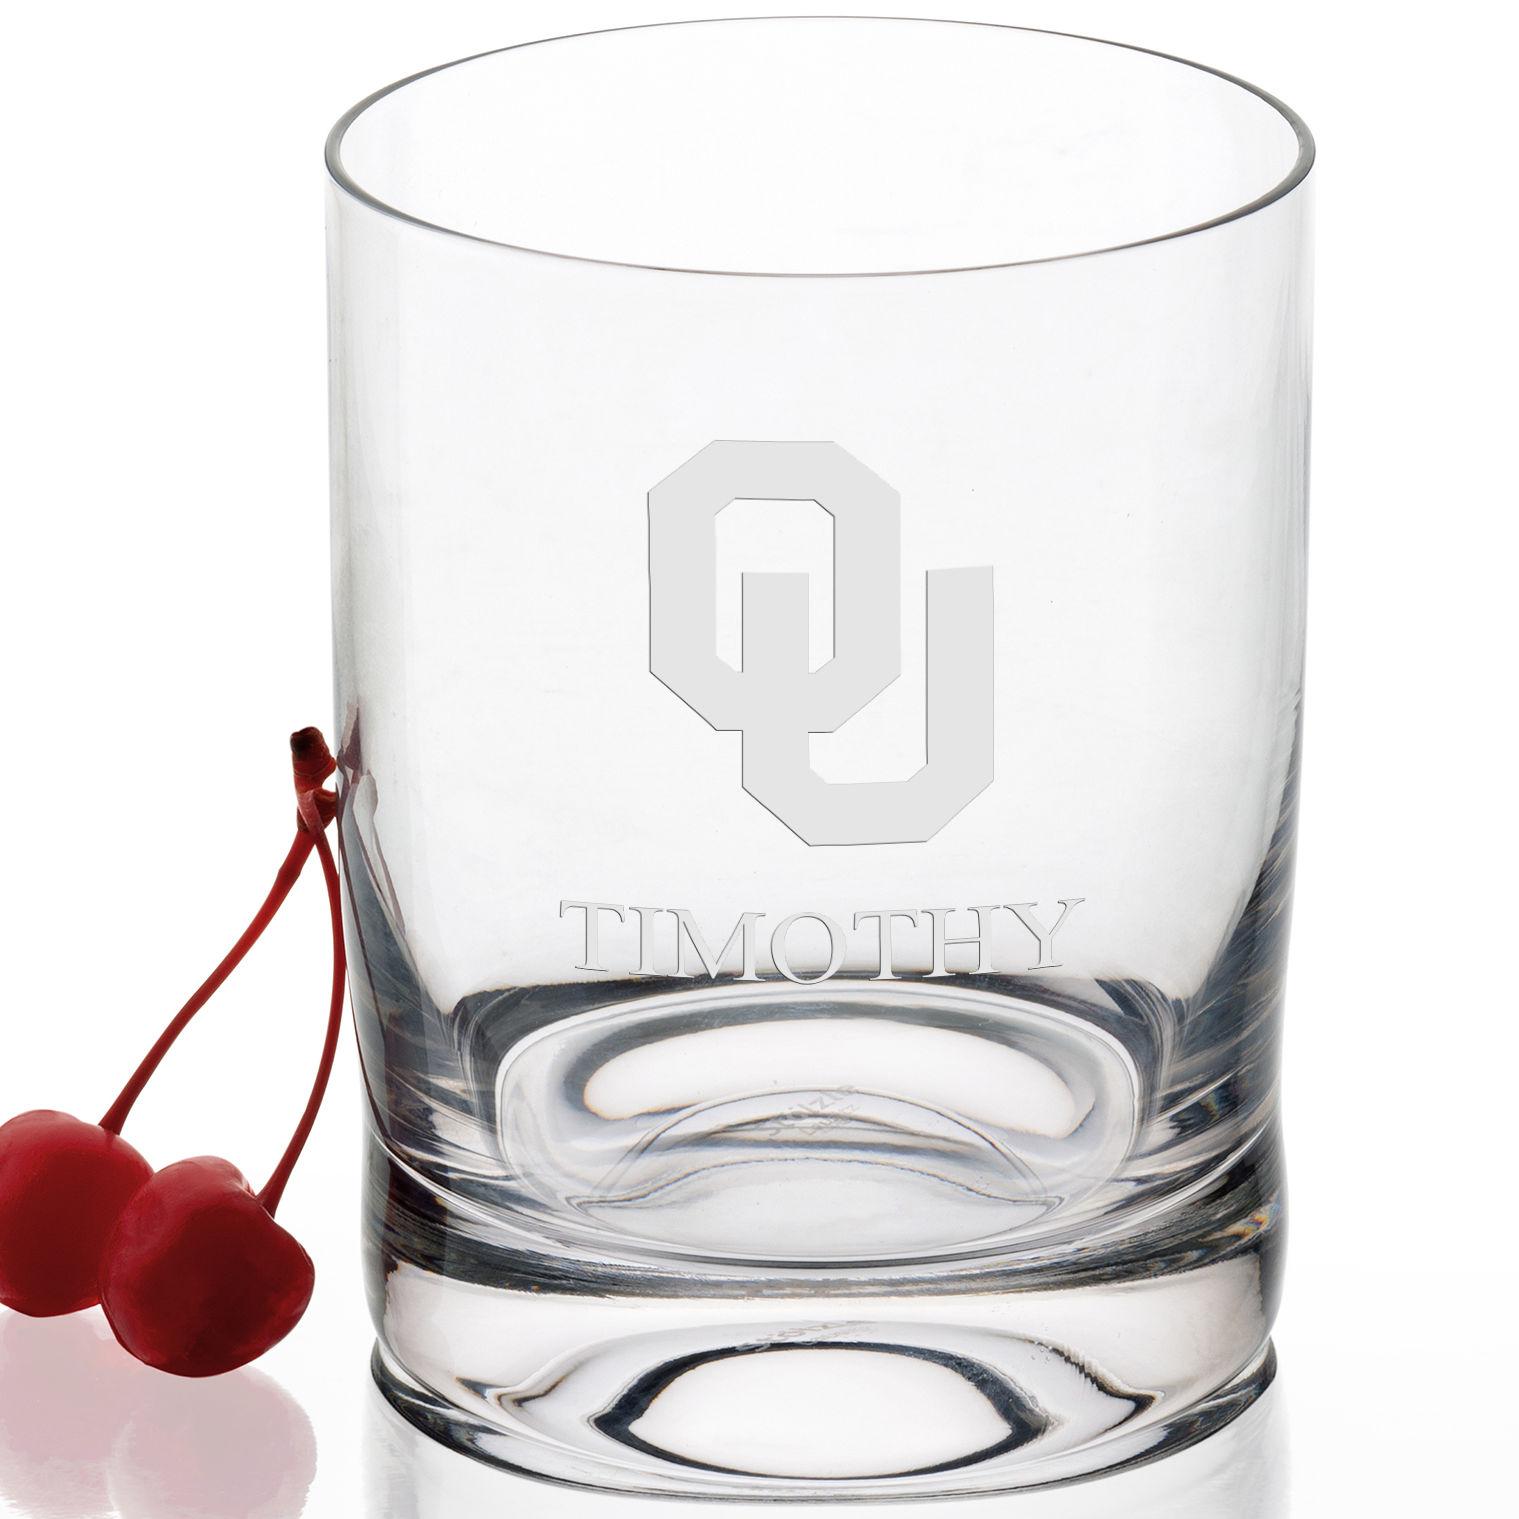 Oklahoma Tumbler Glasses - Set of 2 - Image 2